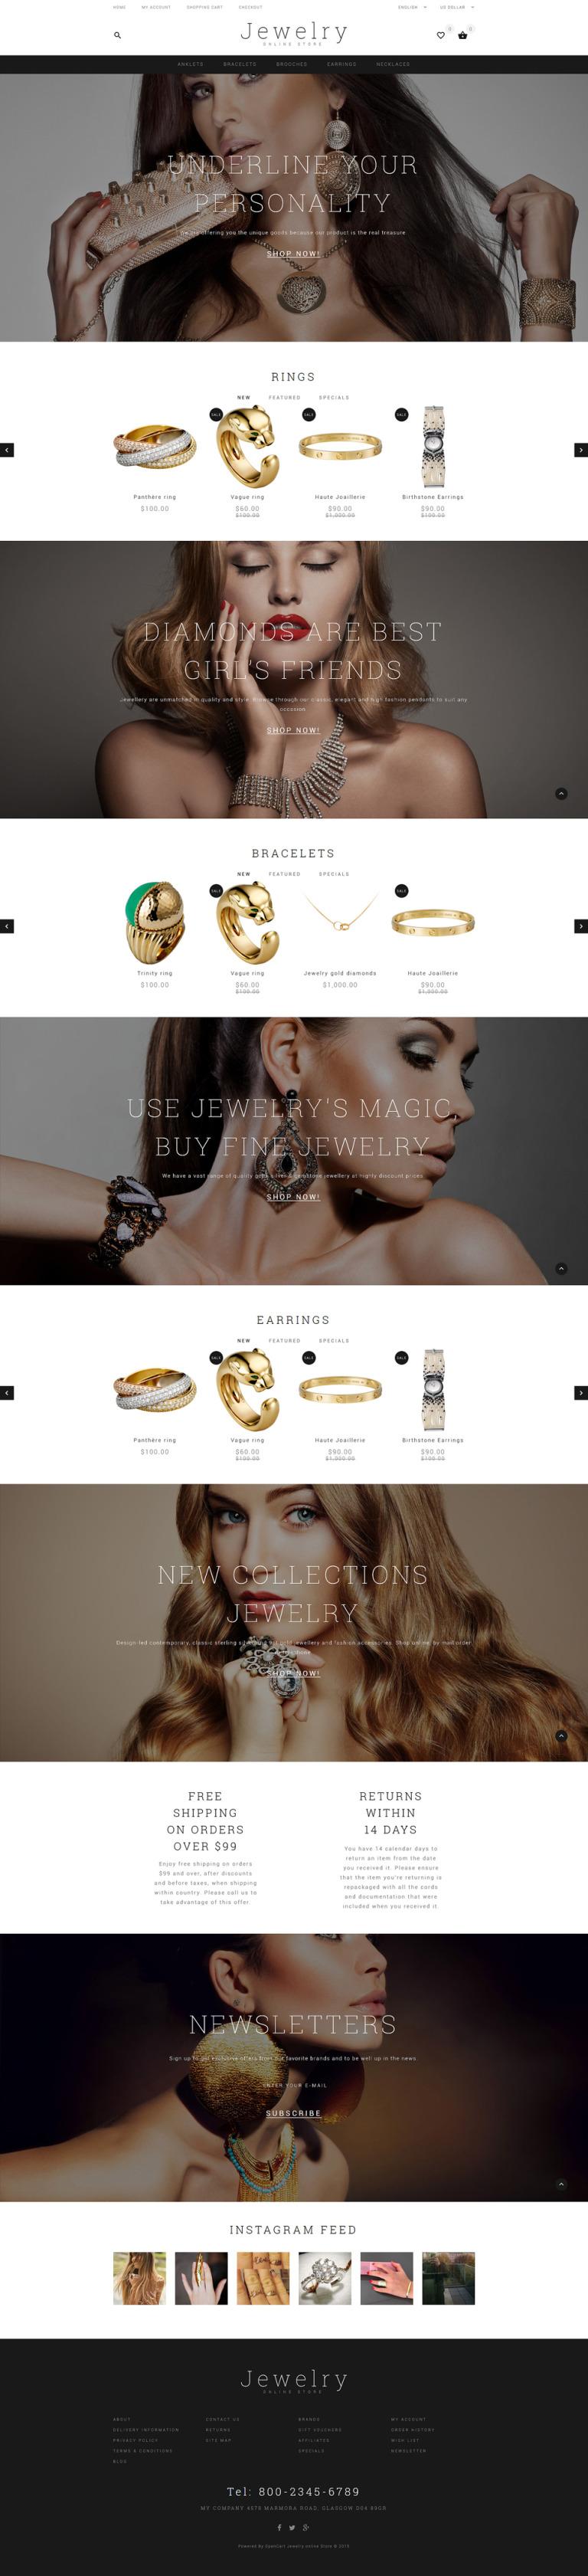 Jewelry Showcase OpenCart Template New Screenshots BIG